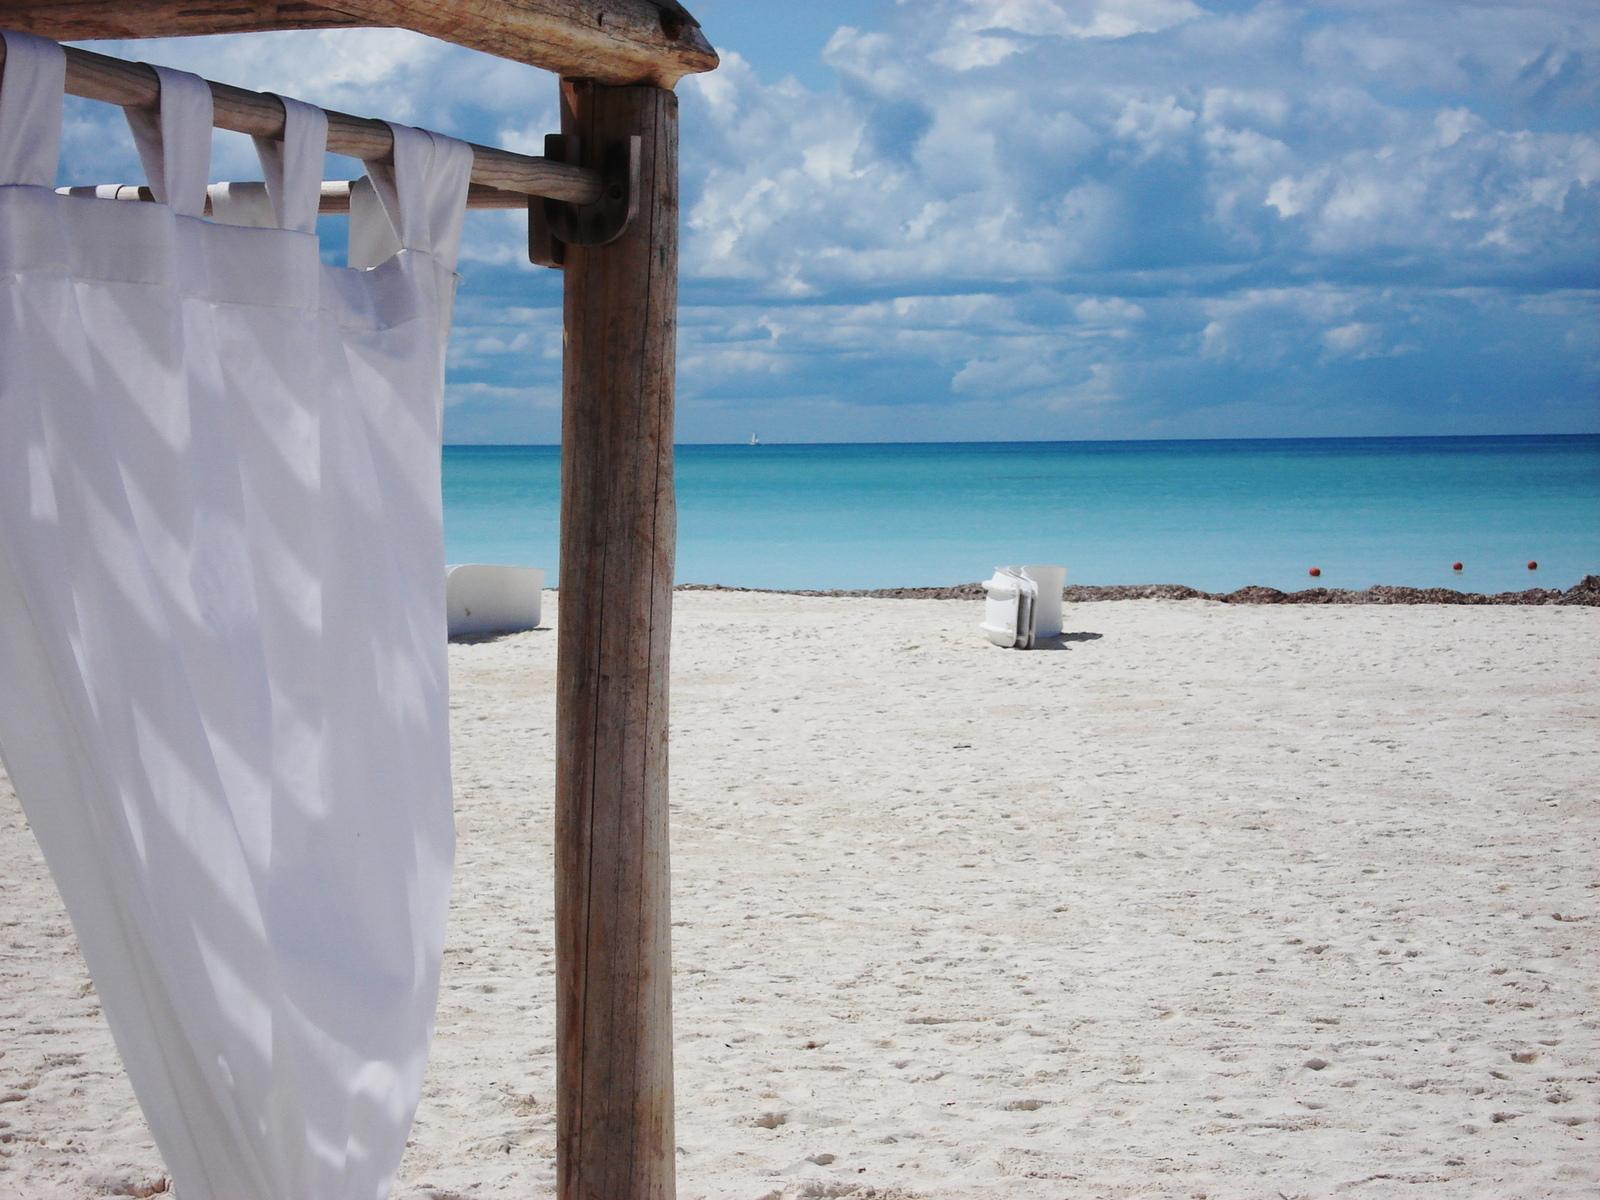 Cozumel My Cozumel Mexico beach image